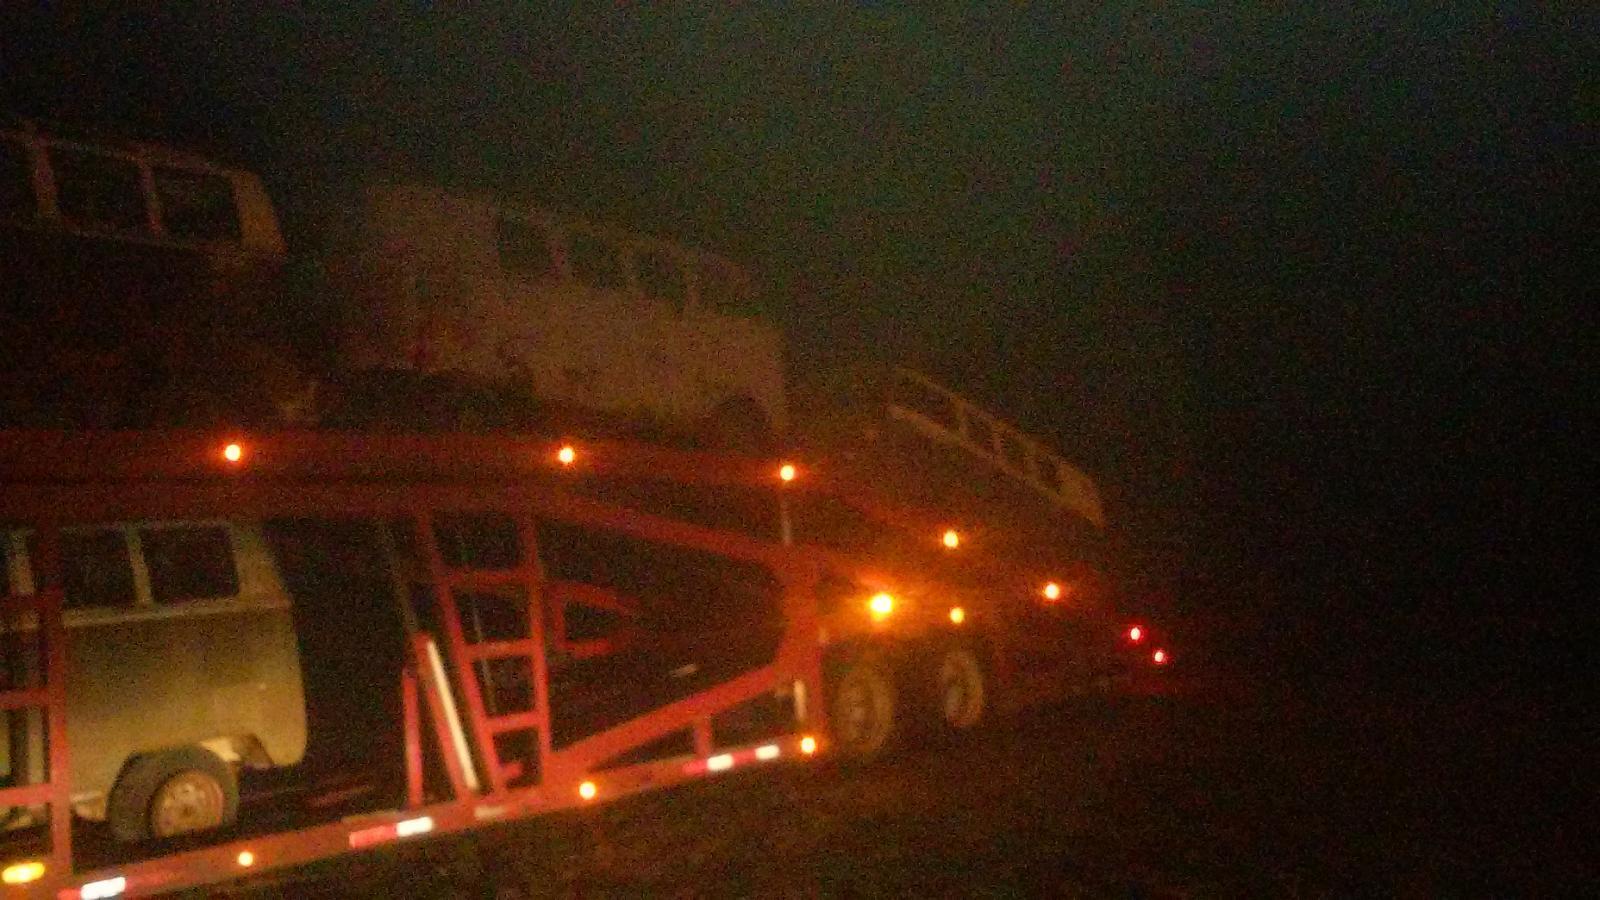 Truck loads of vw busses leaving